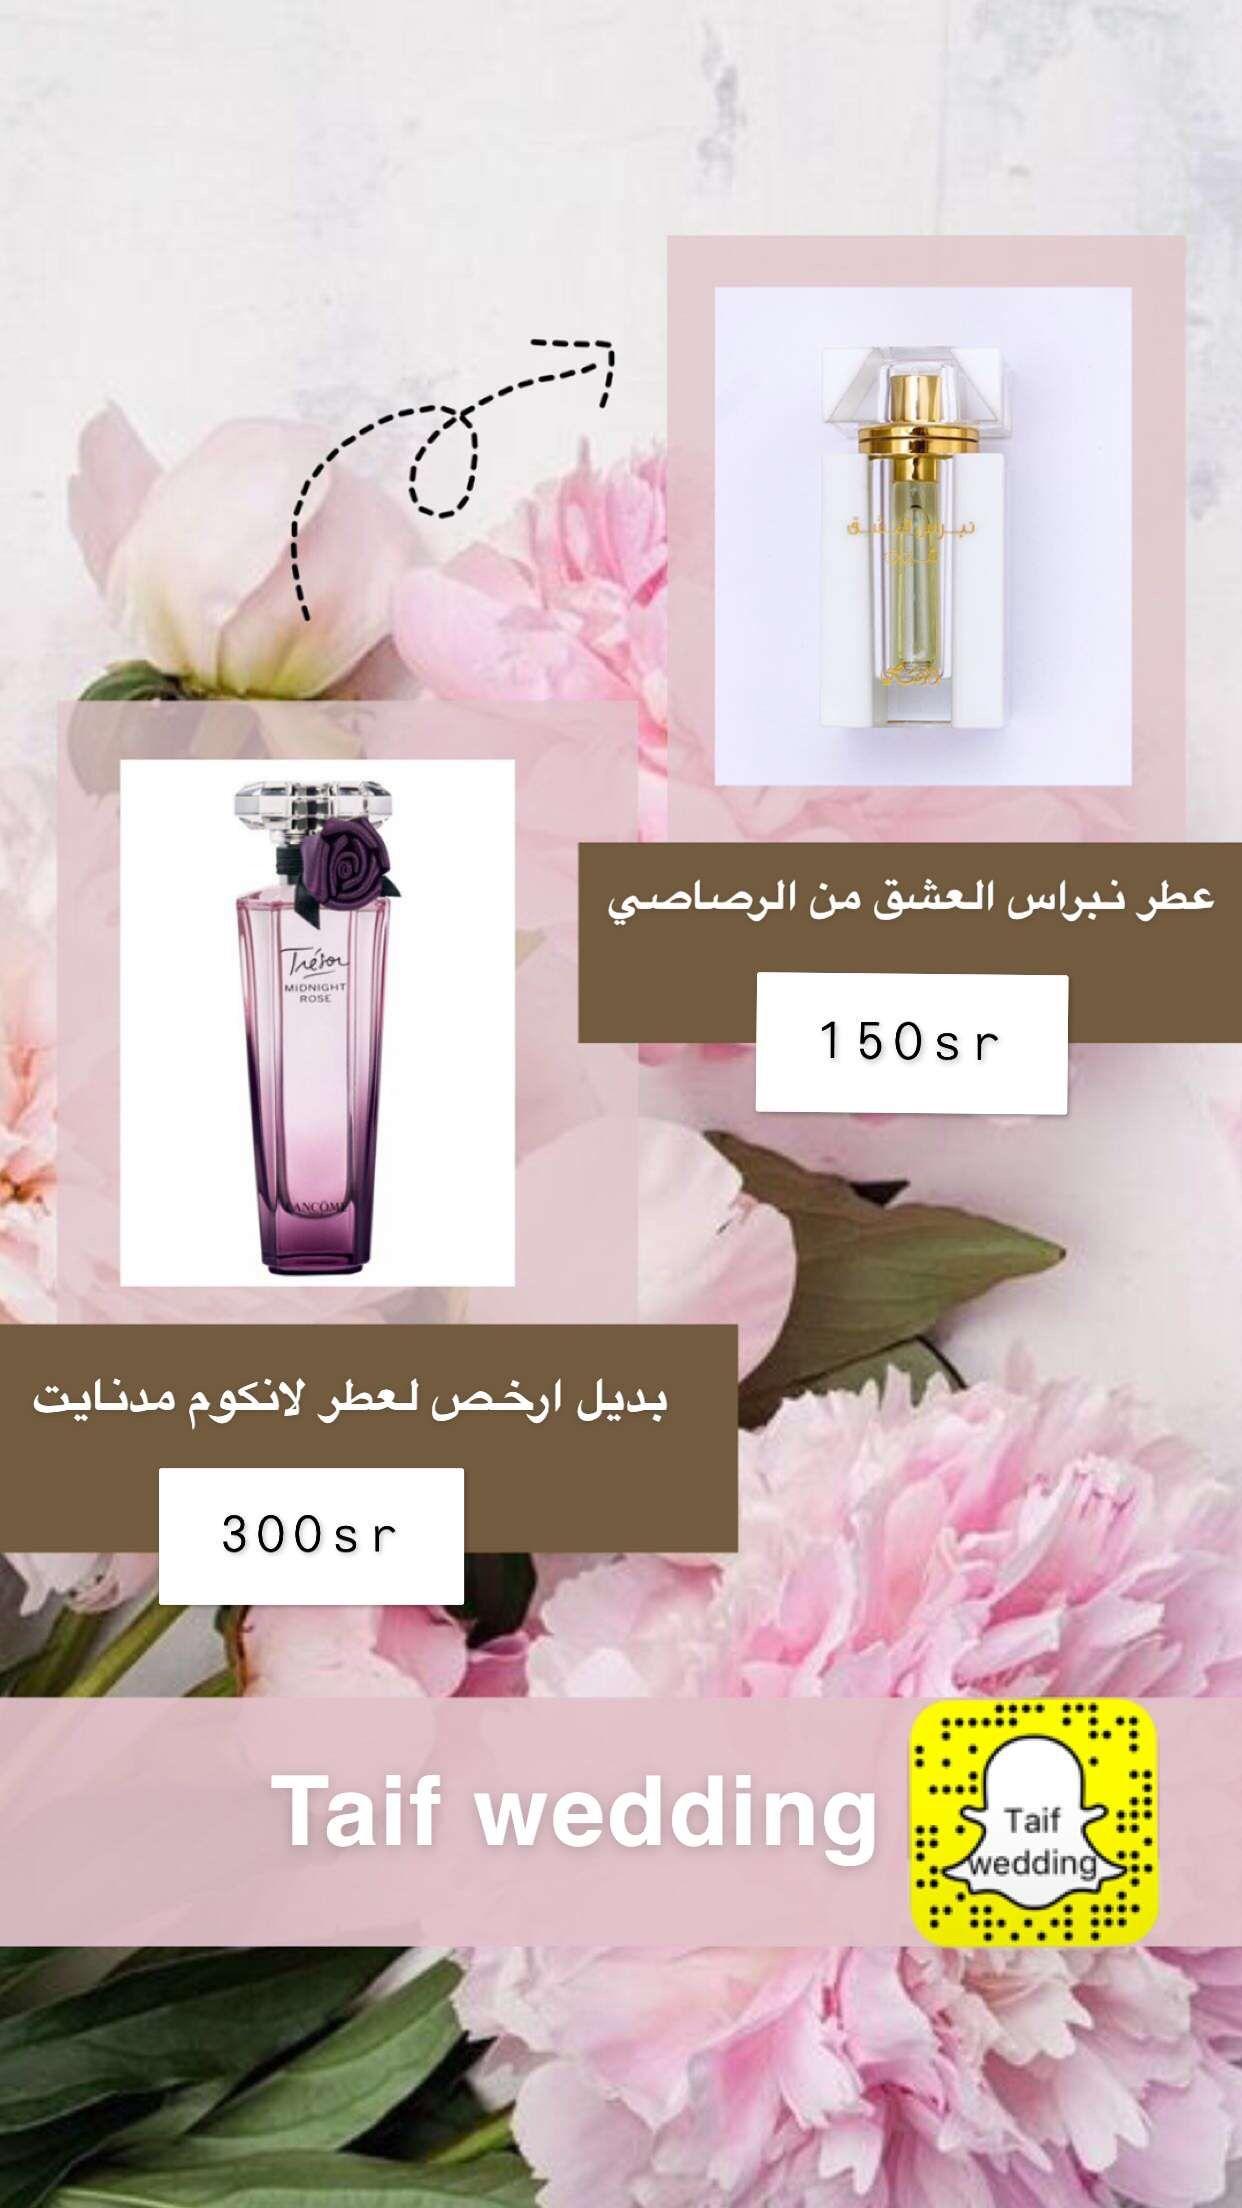 بديل ارخص للعطور Place Card Holders Wedding Perfume